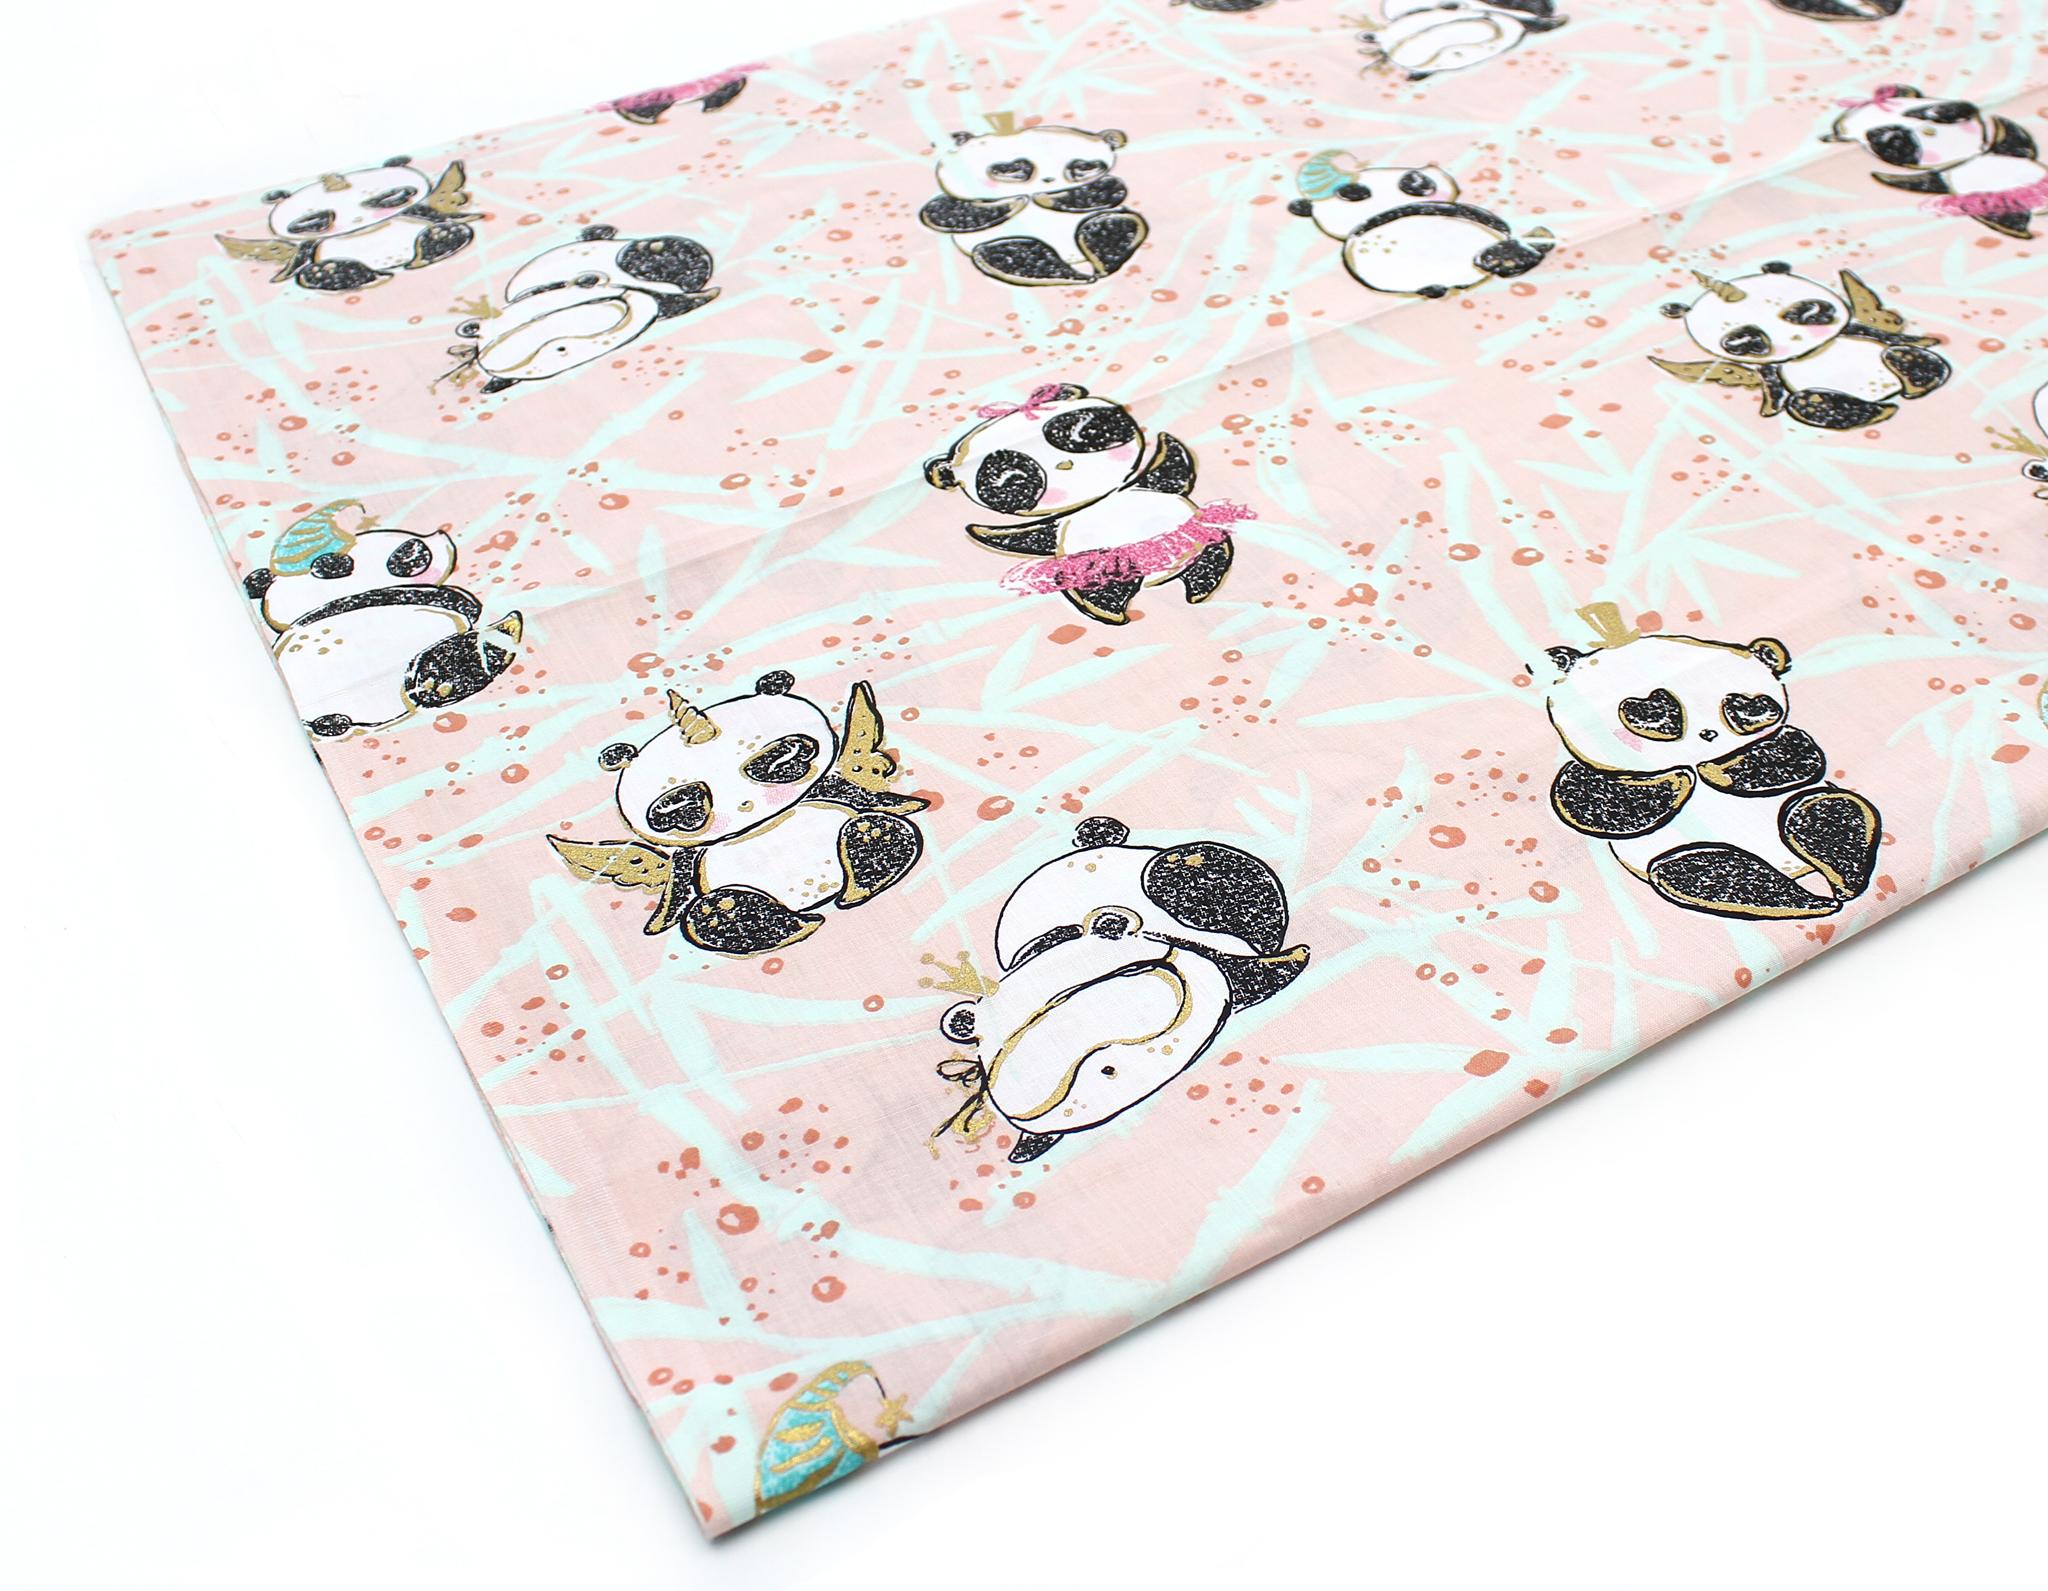 Панды,карнавал(золото,глиттер),розовый фон